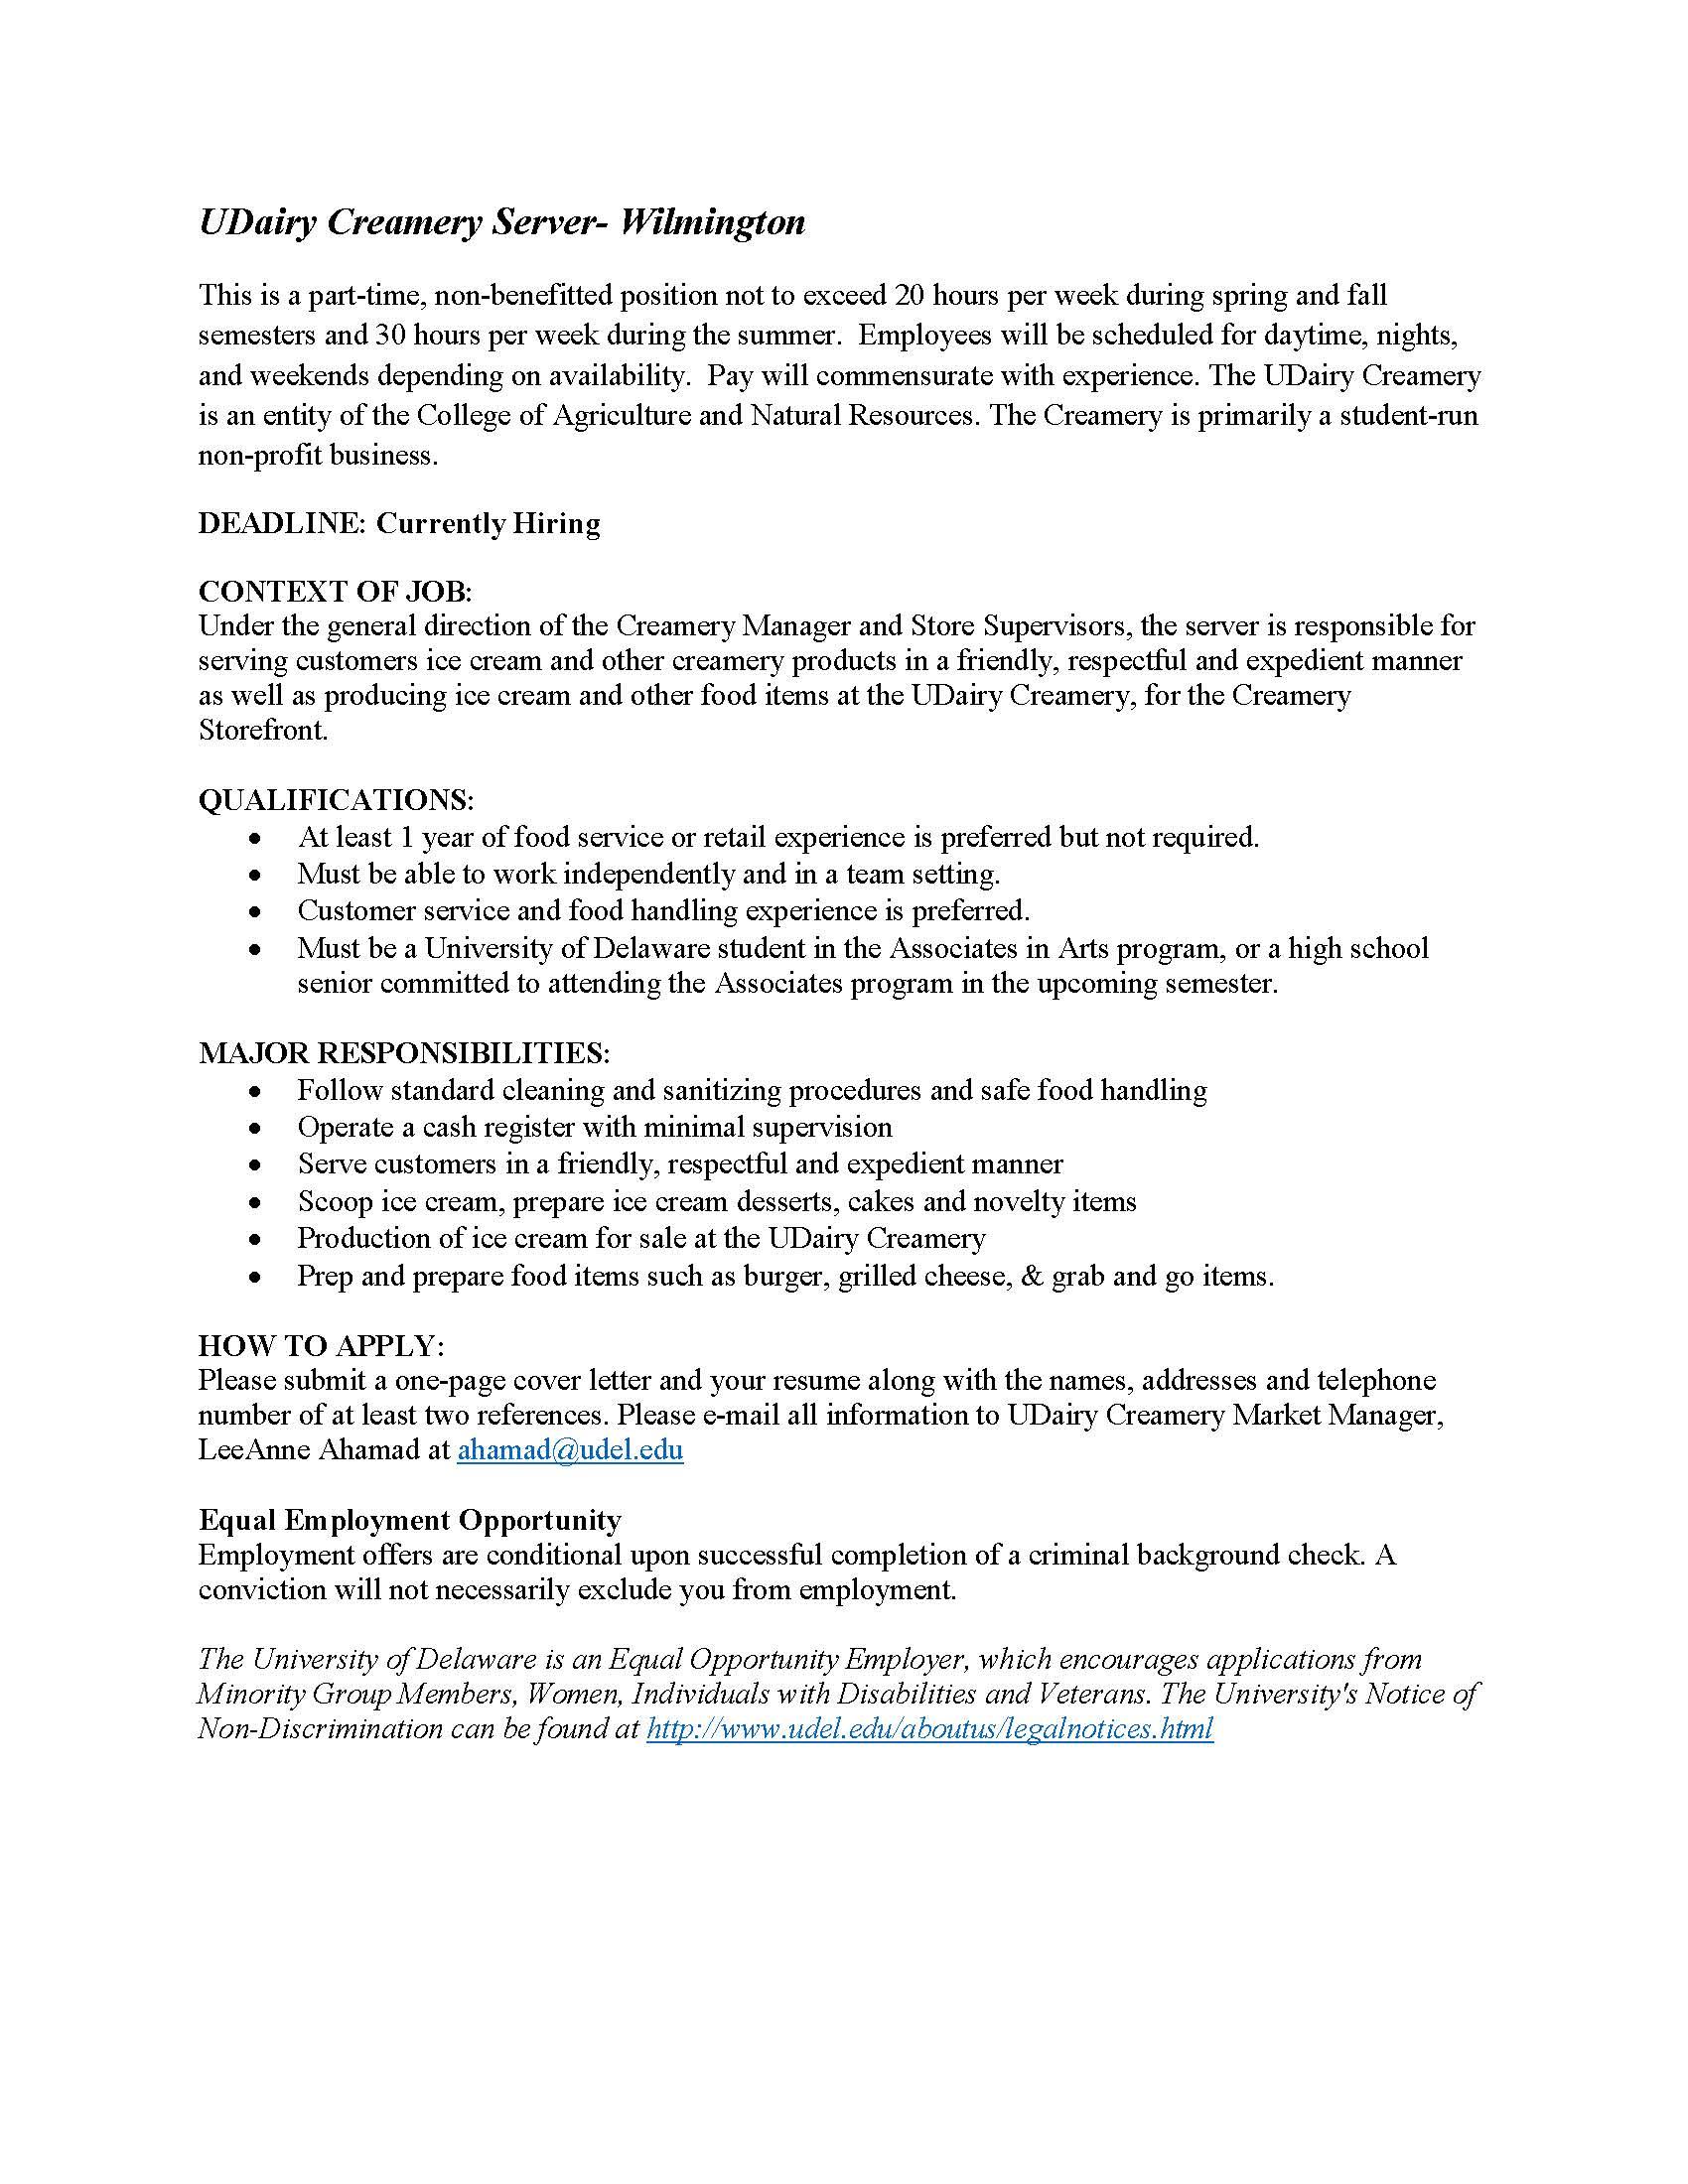 WordPress For UD   University Of Delaware  Preferred Resume Group